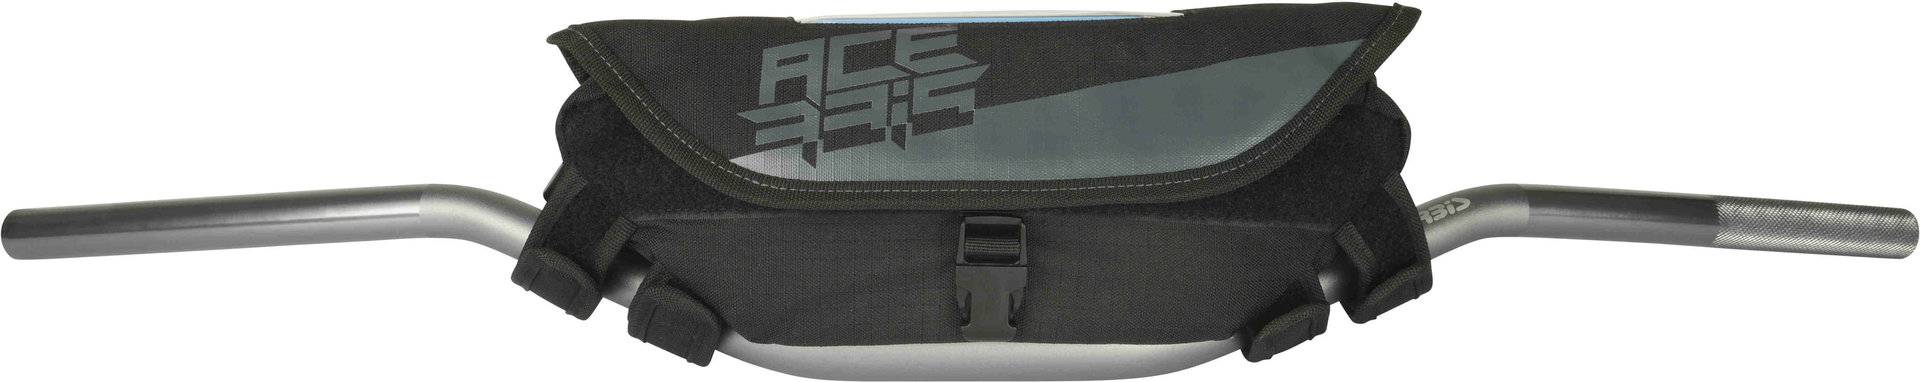 Acerbis Manubag Tool Bag  - Size: One Size